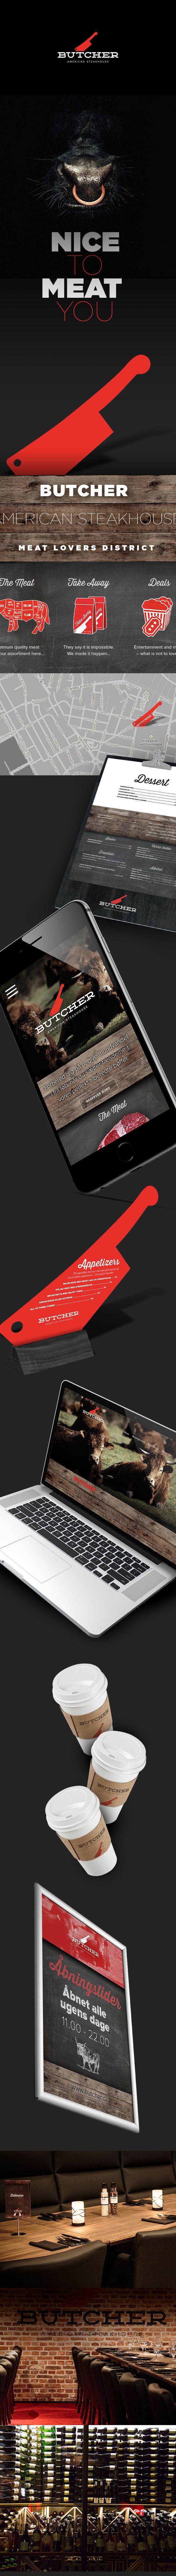 Butcher - American Steakhouse on Behance